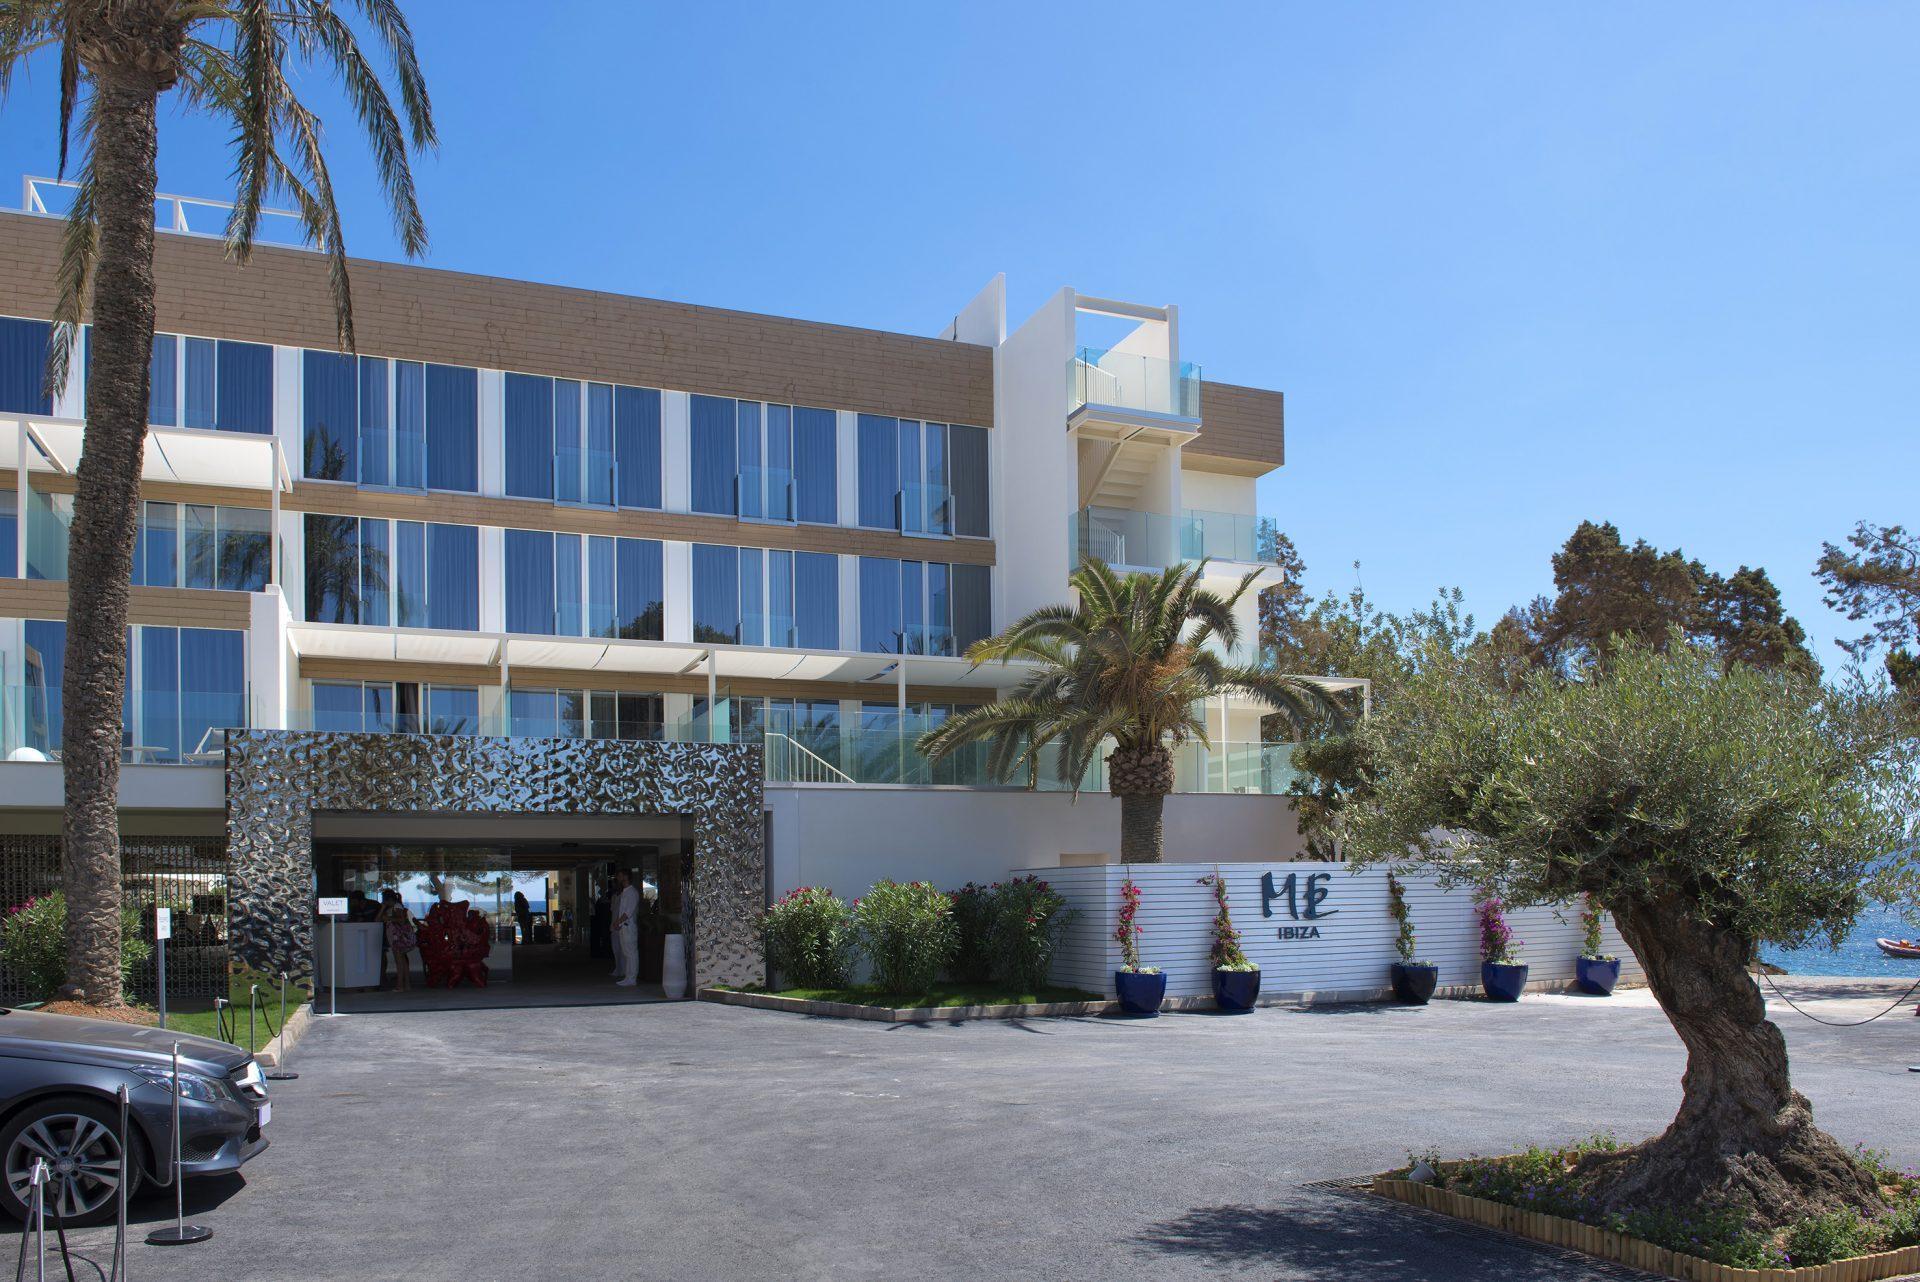 008ME Ibiza General Entrance